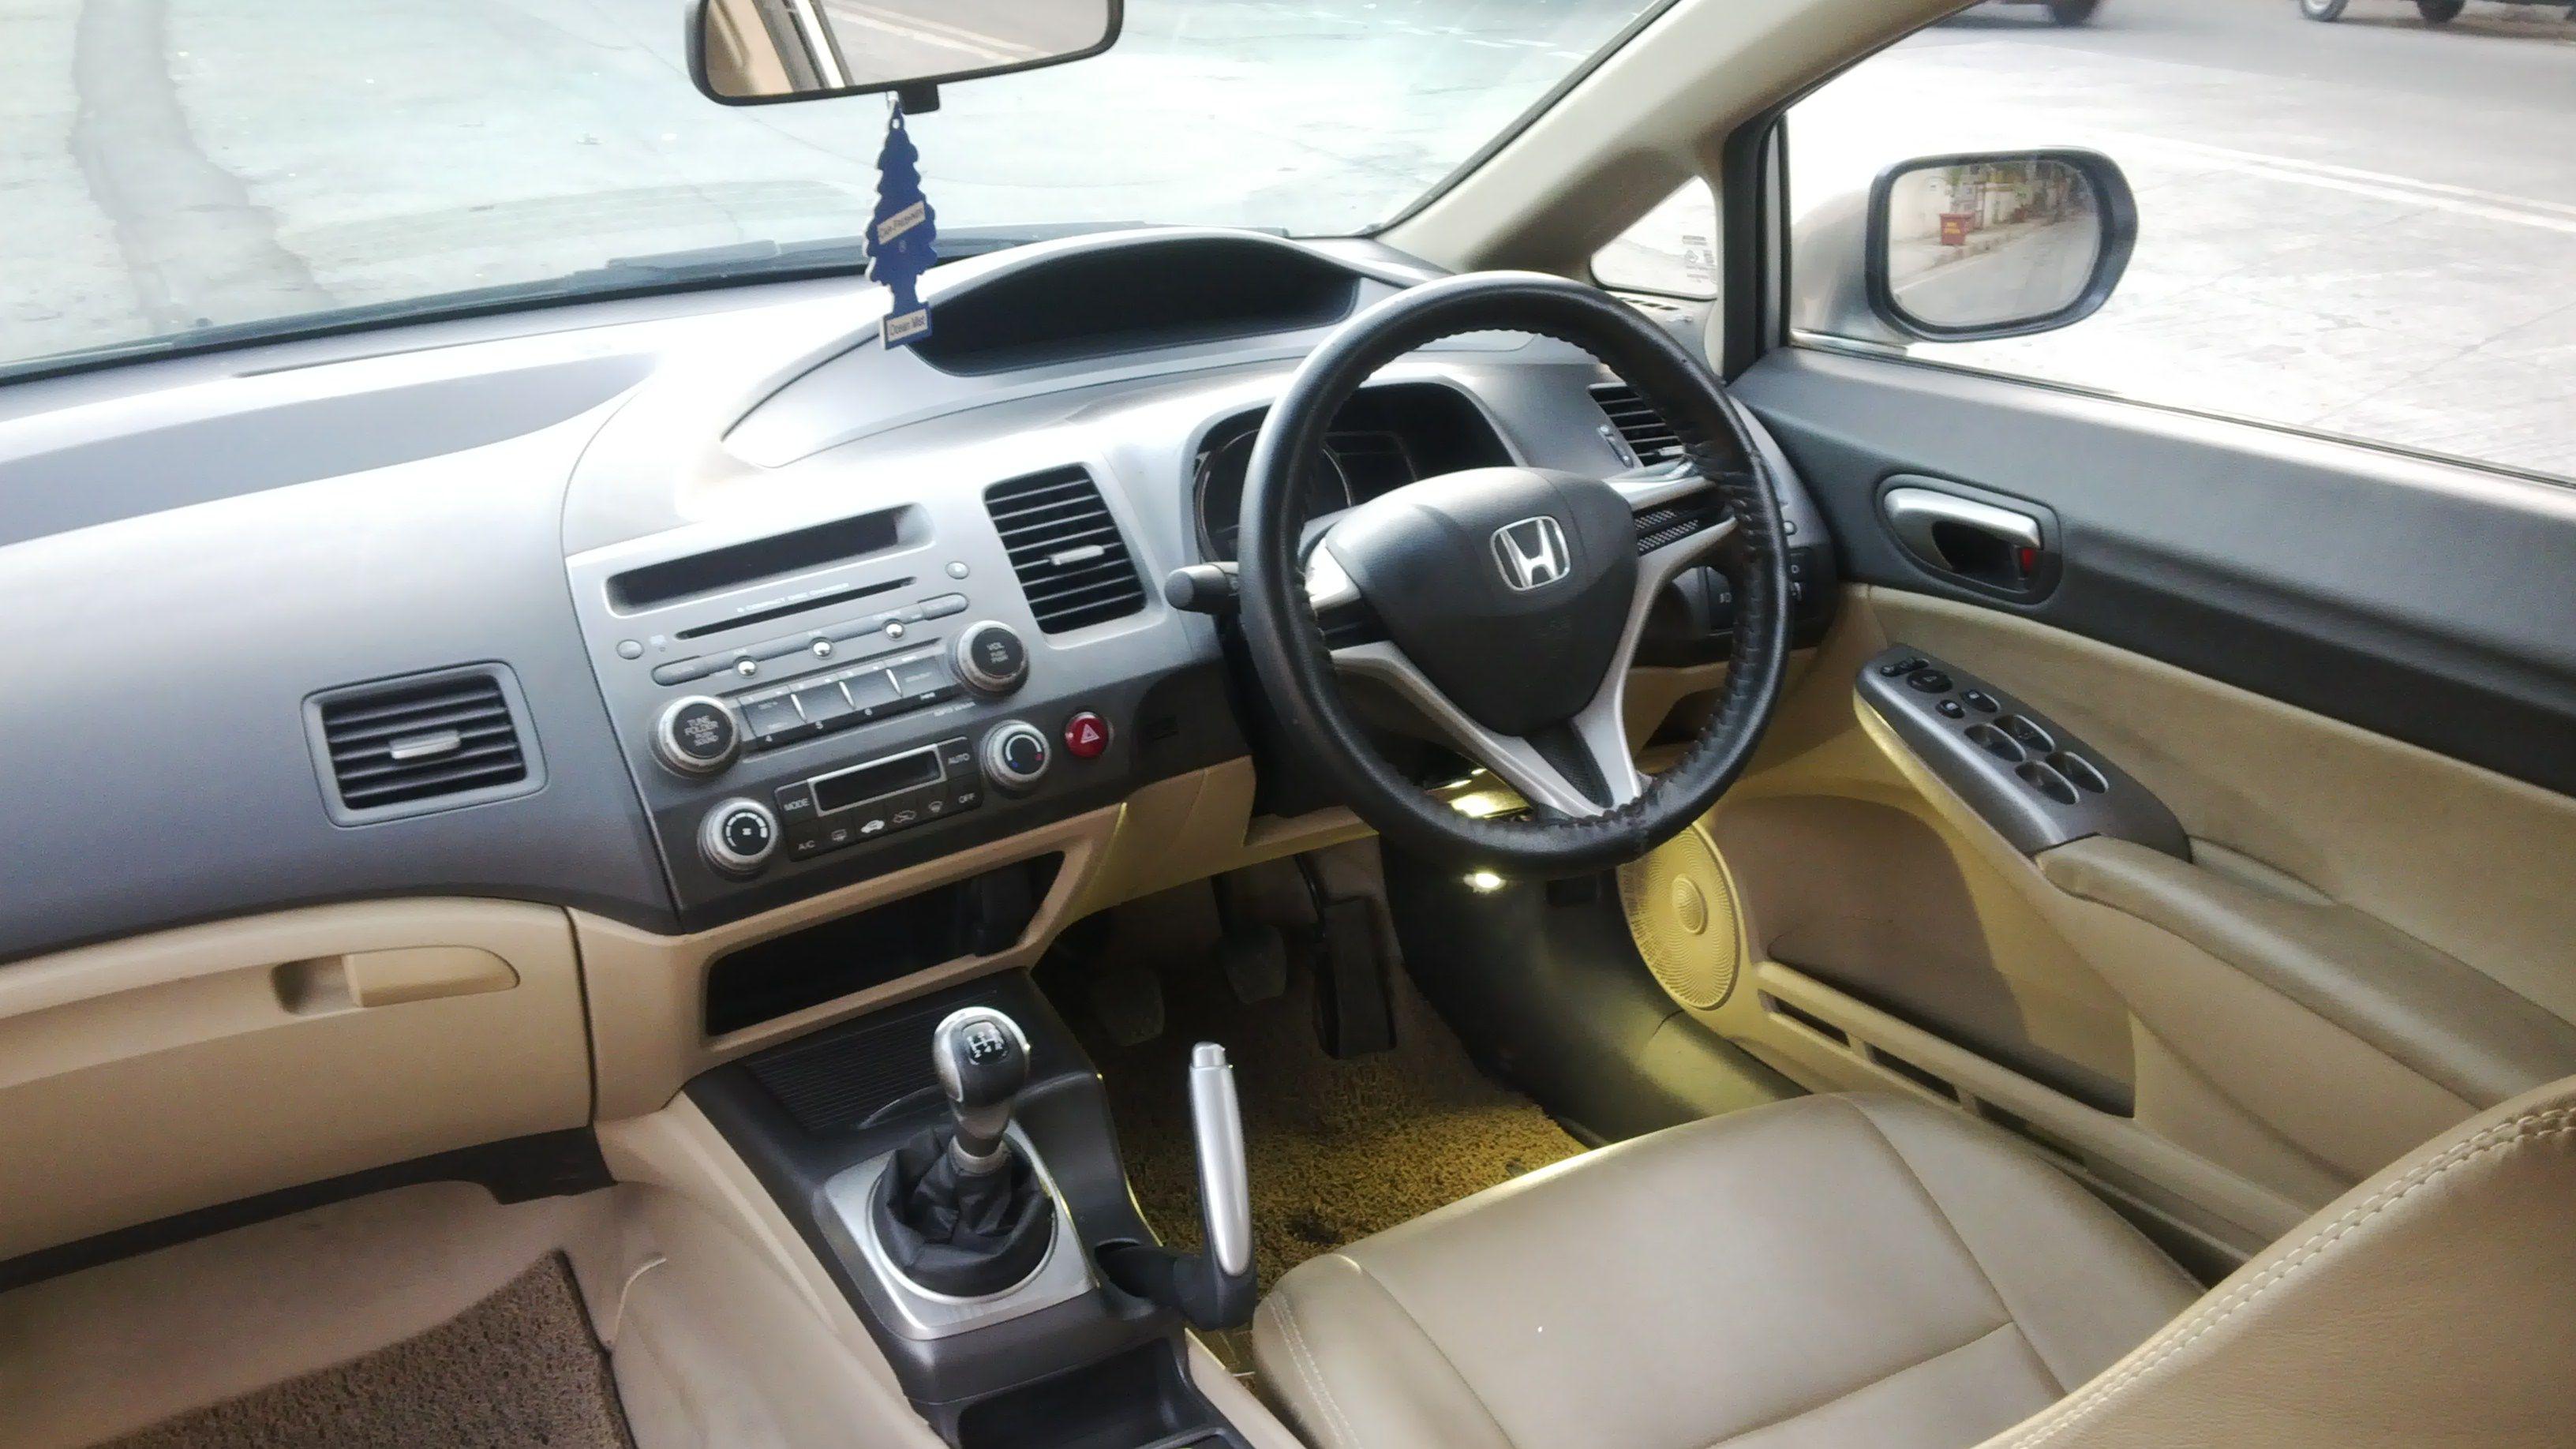 User Guide · Used Civic Interior Pic Honda Models, Honda Civic, Interior  Lighting, Manual, Leather